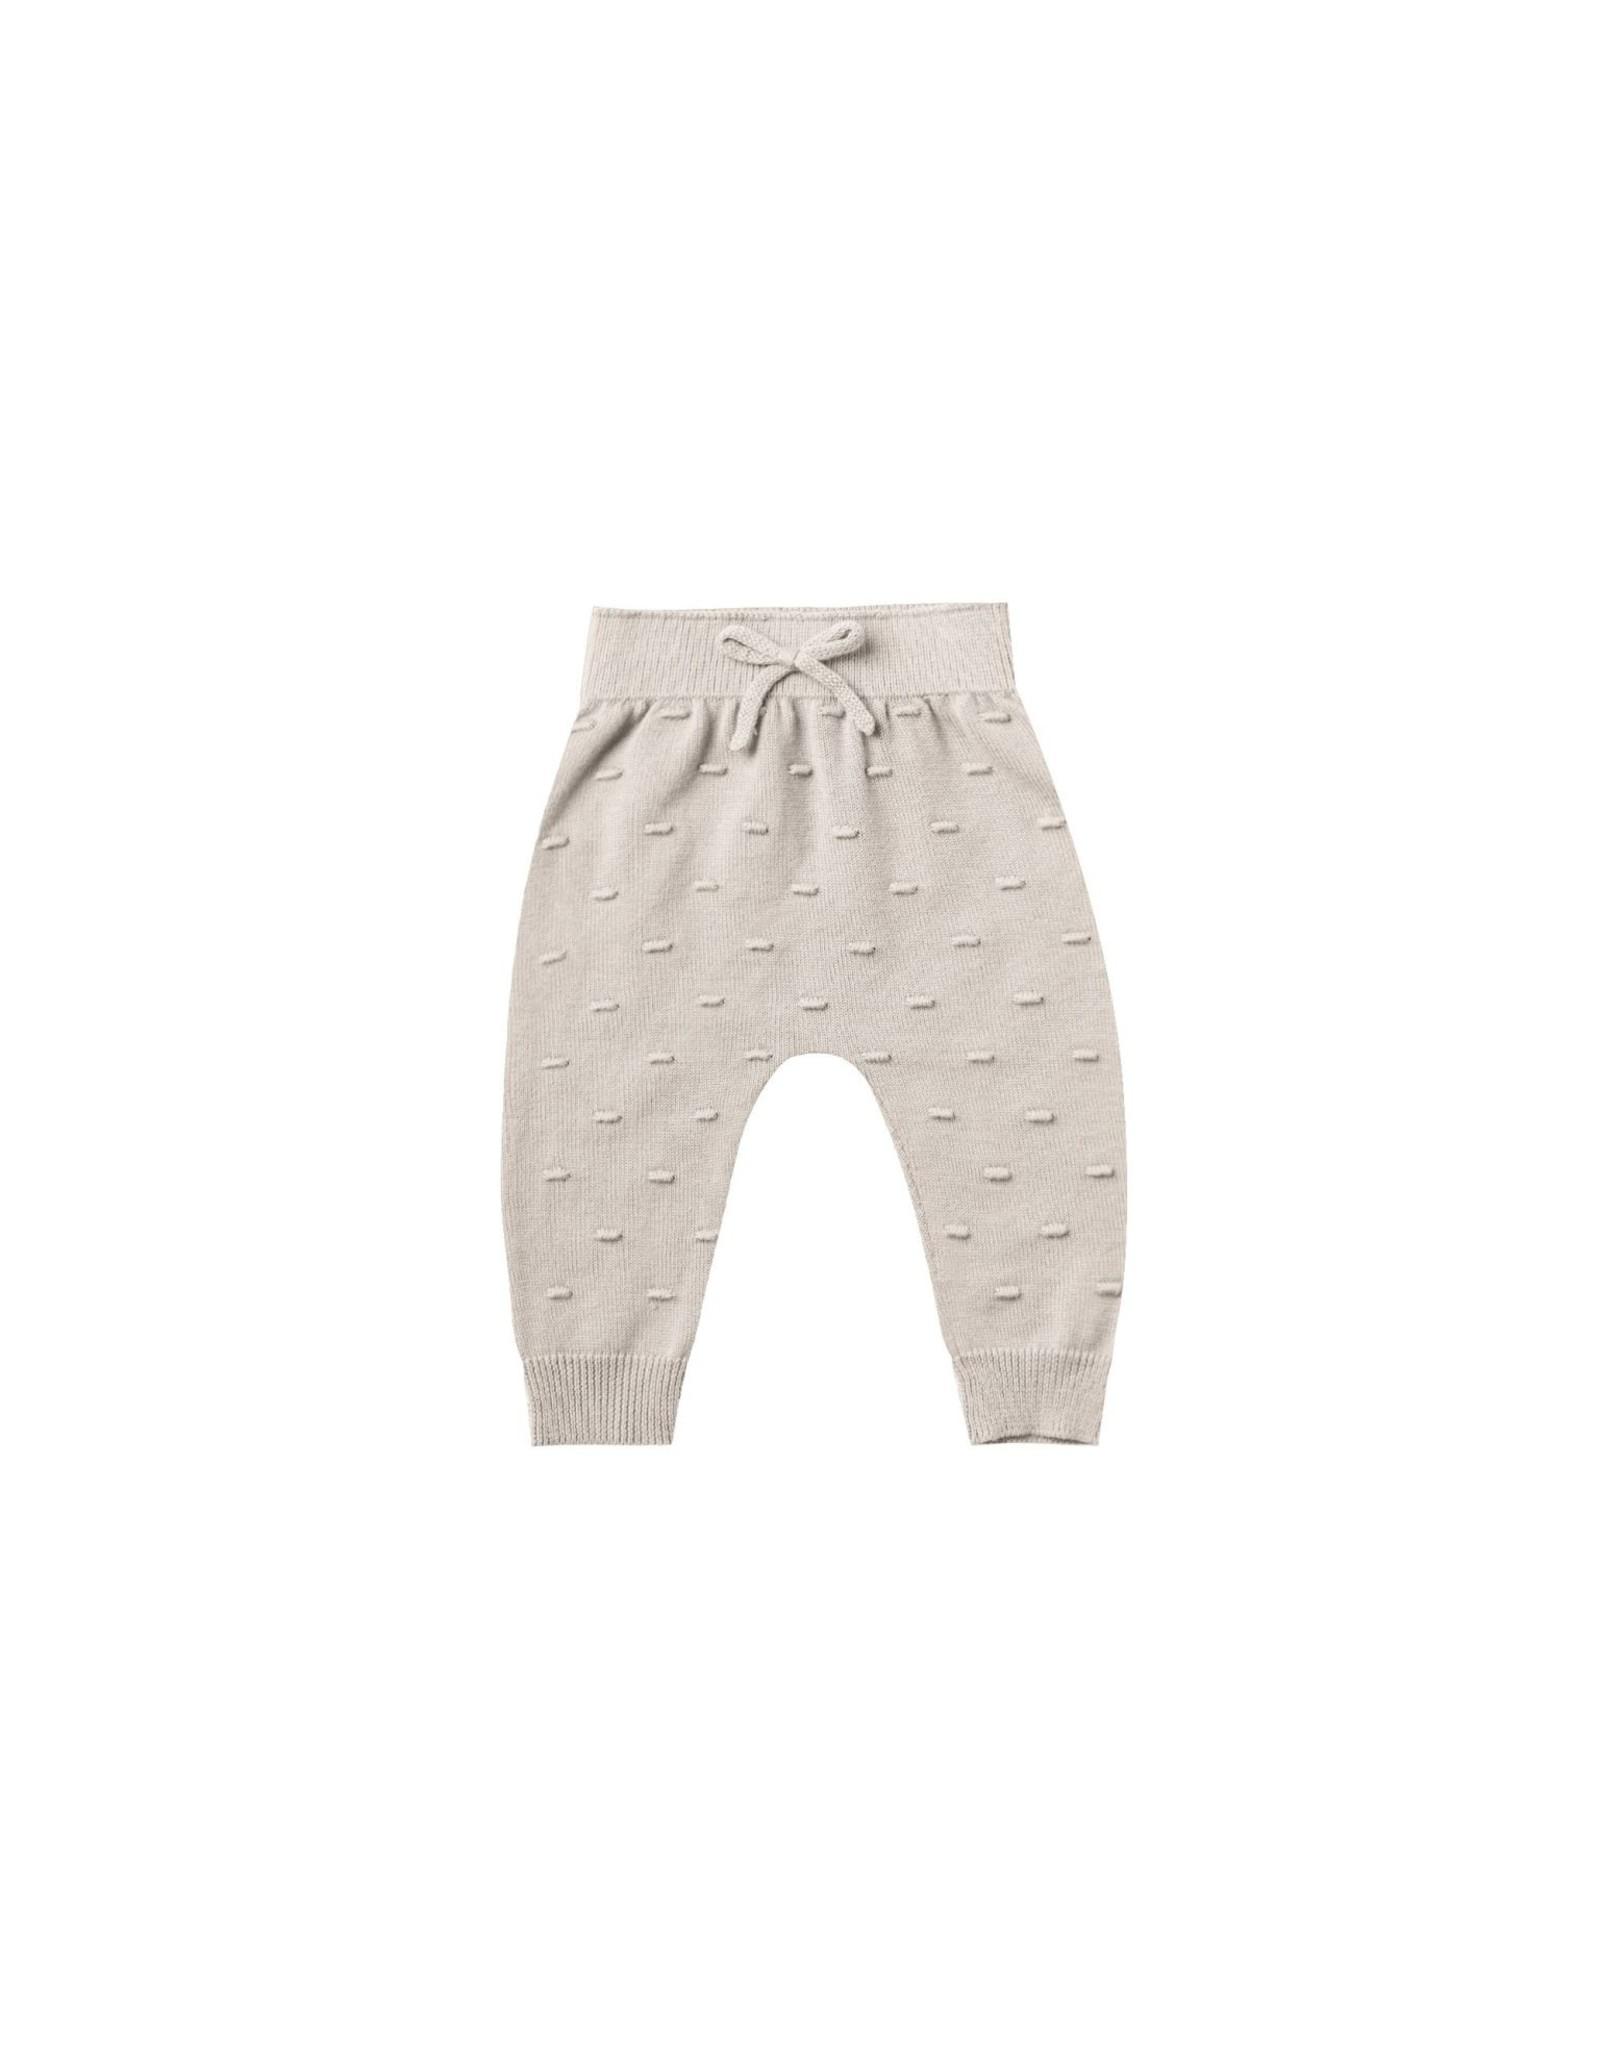 Quincy Mae knit pant- fog